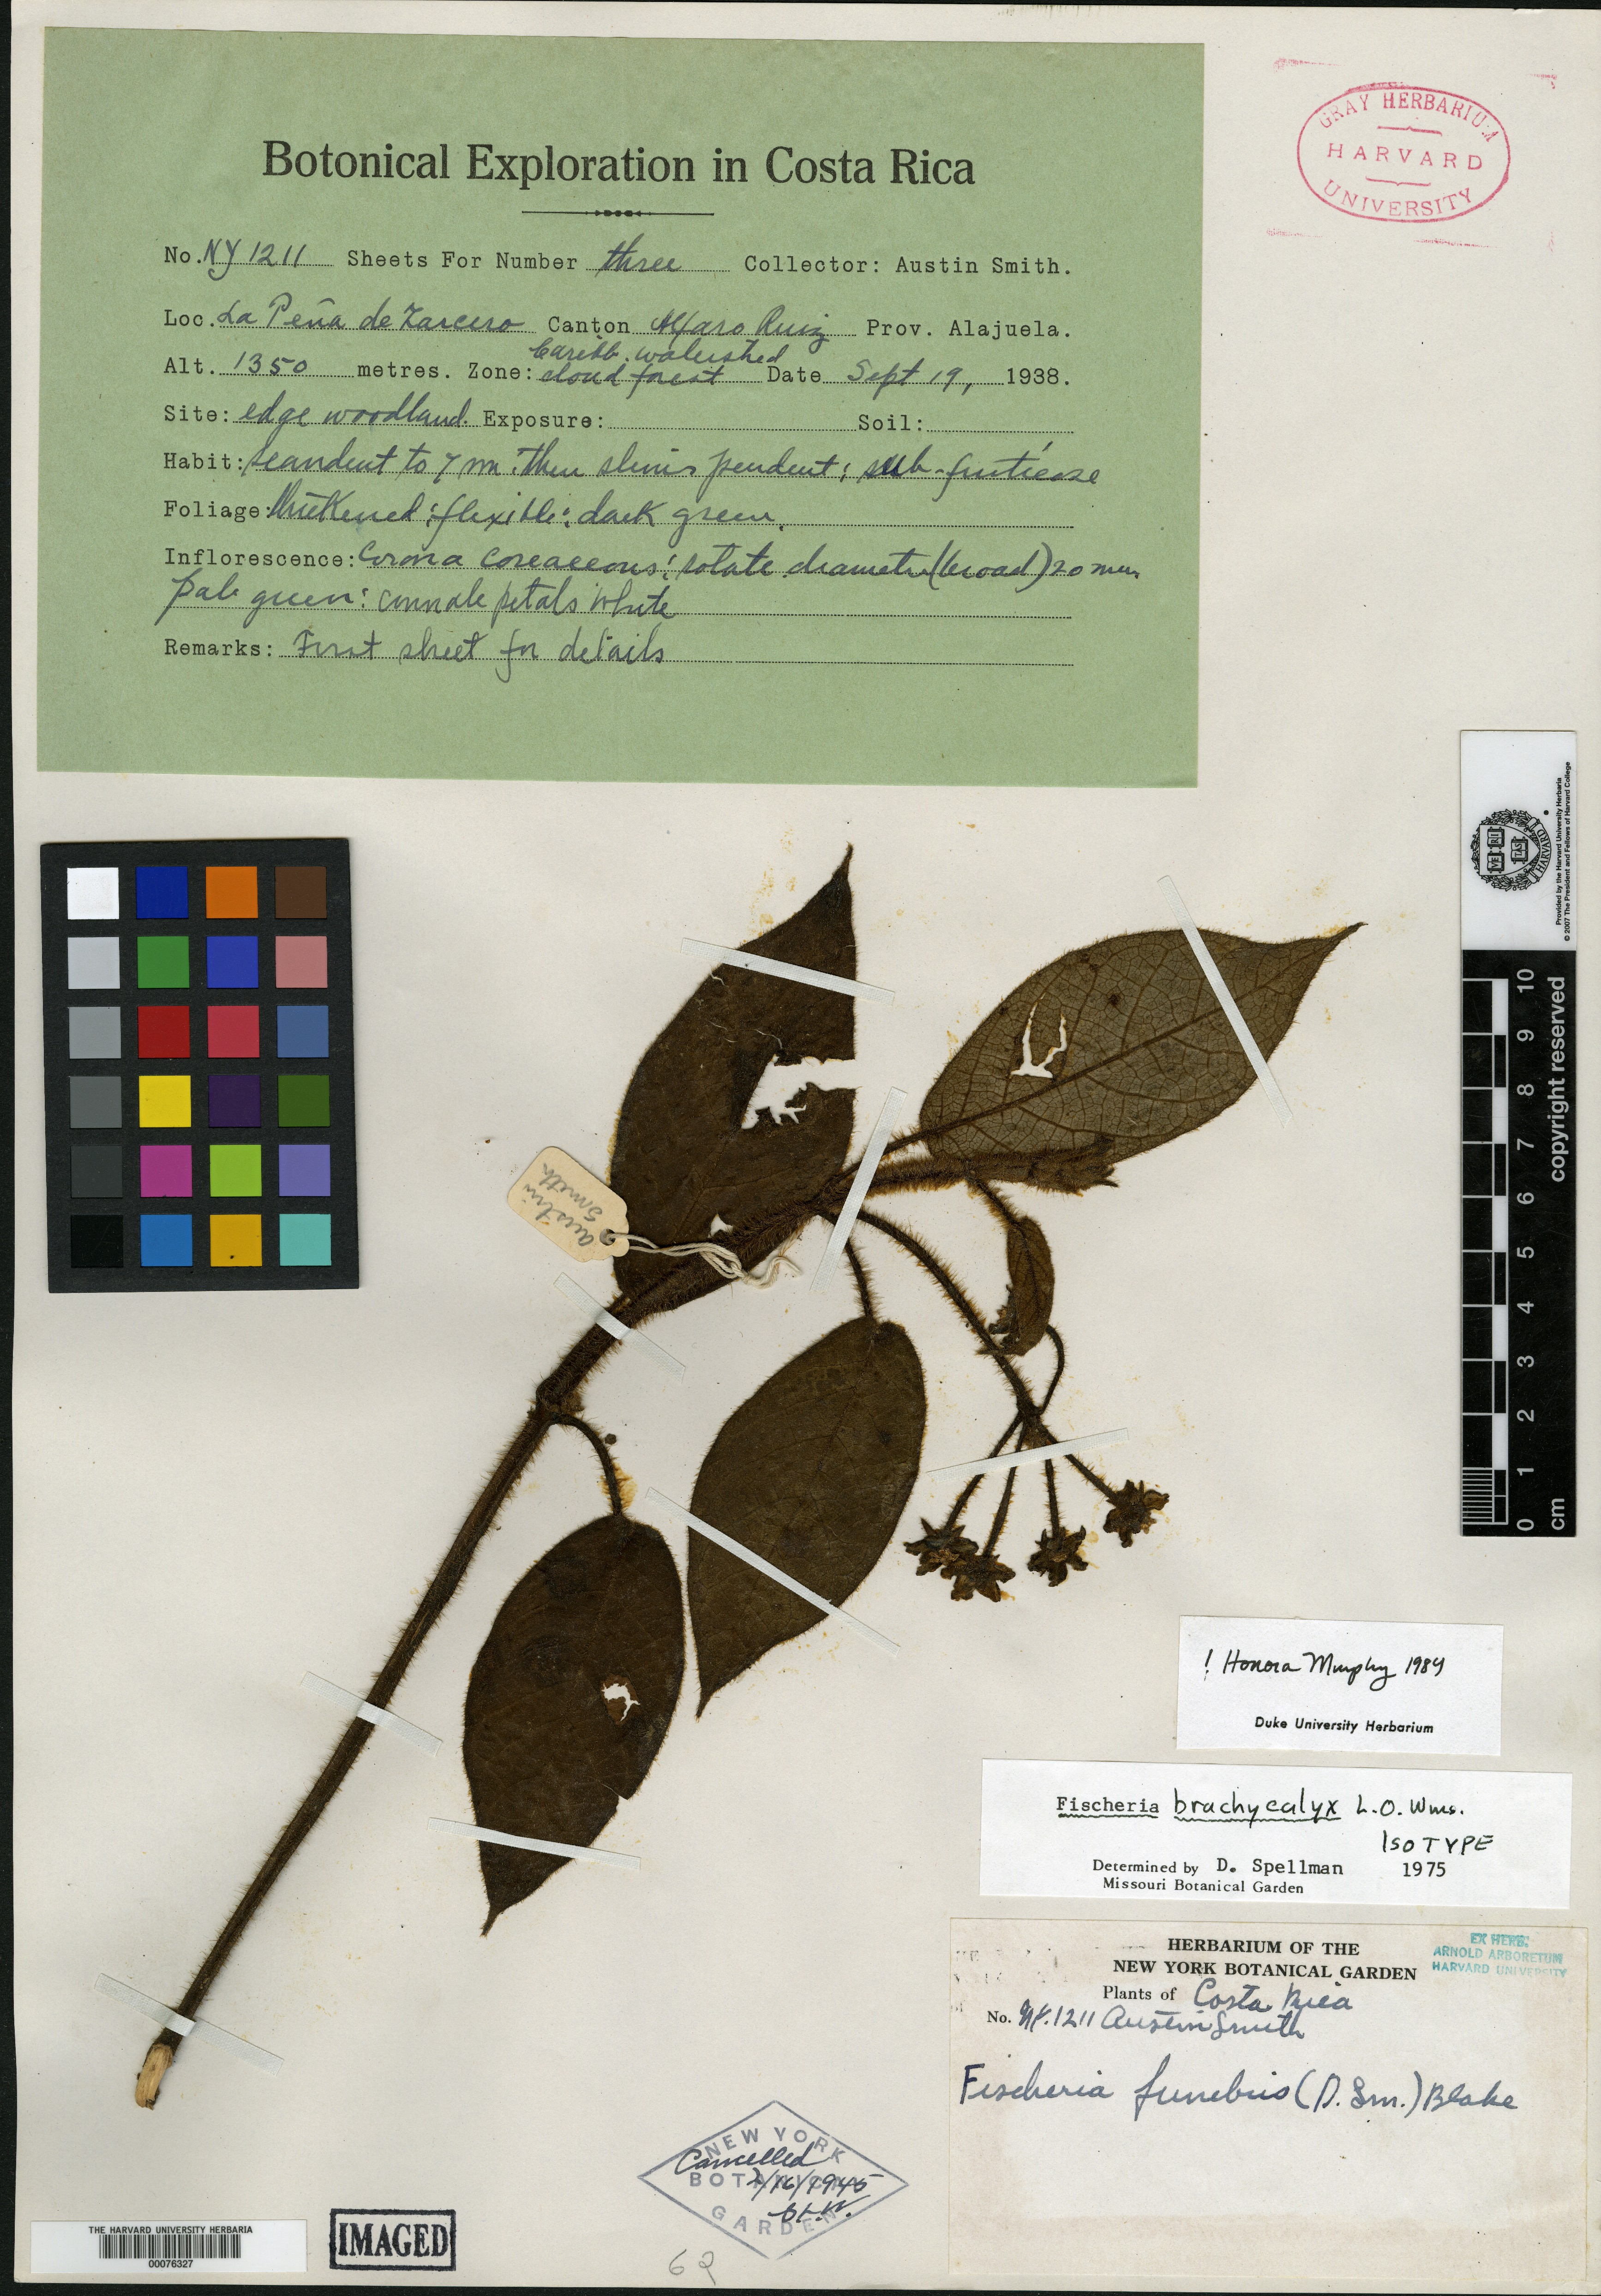 Fischeria brachycalyx image